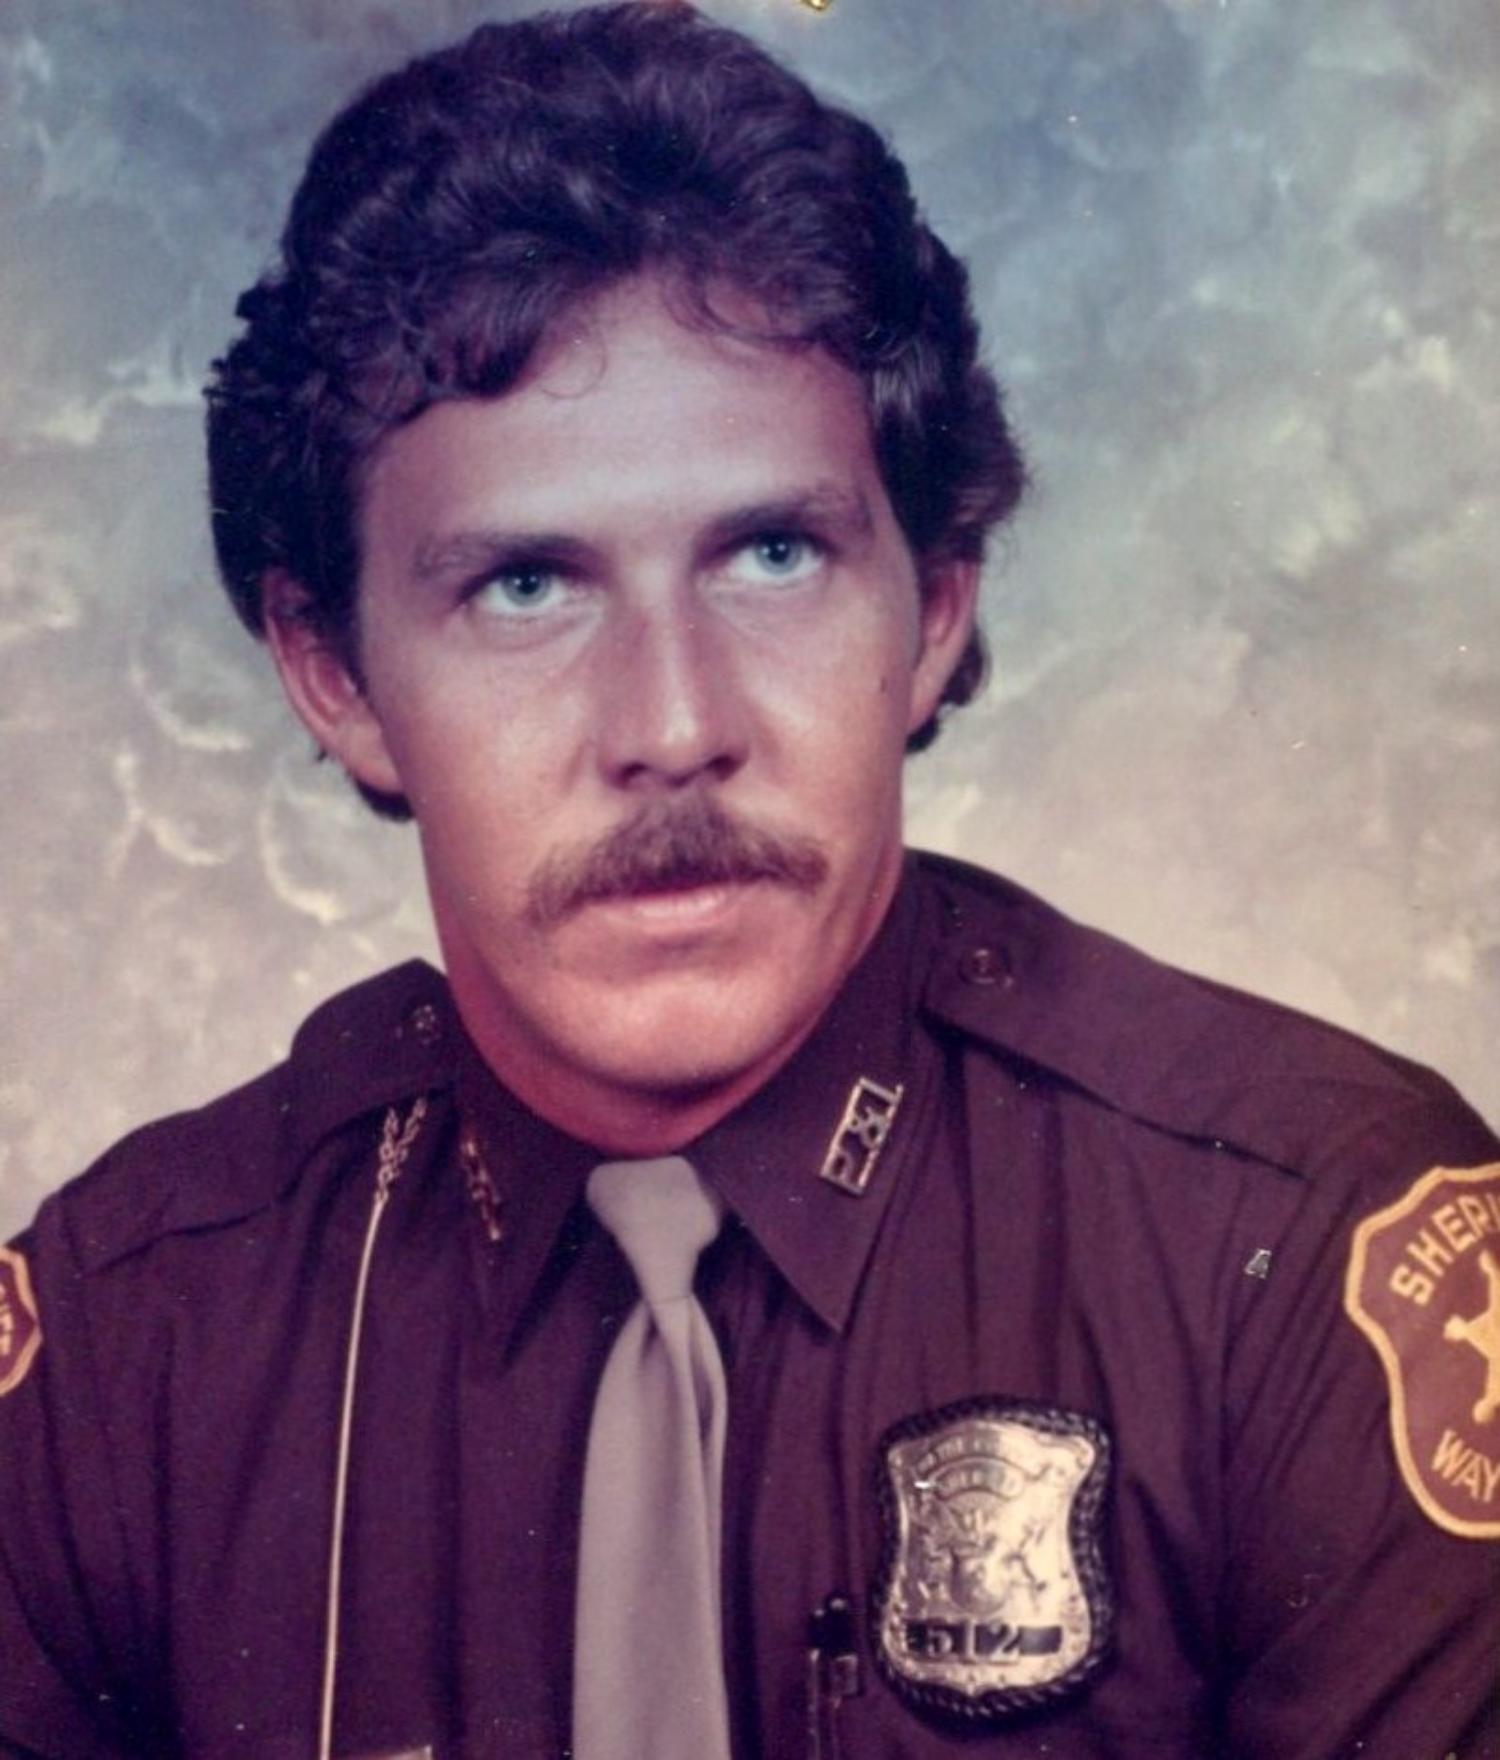 Officer Ed Reedy